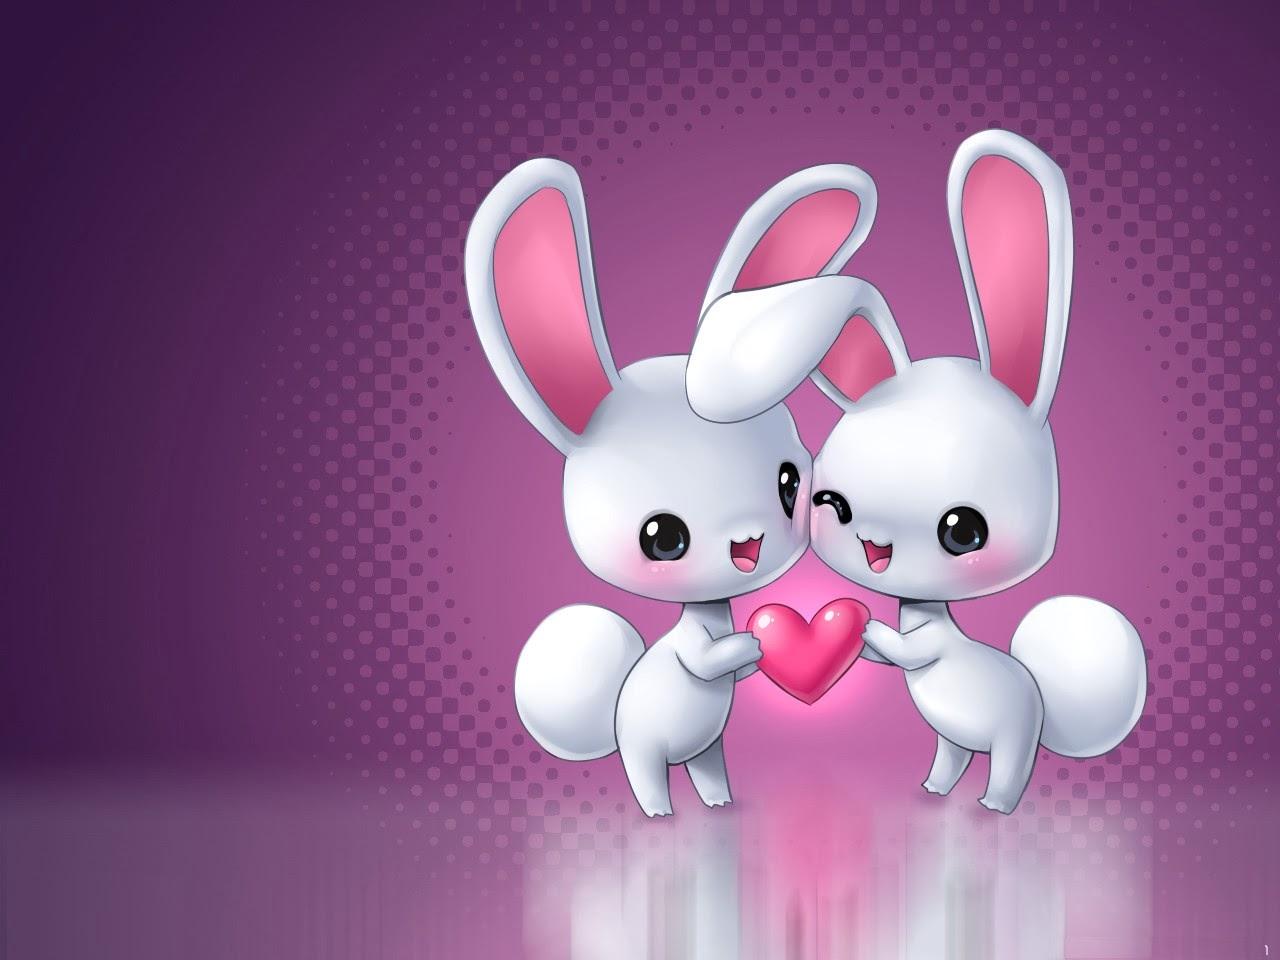 ��� �� ����� ��������� ������ ��� 2016 , Pictures romantic love computer Facebook 2015_1393596474_729.